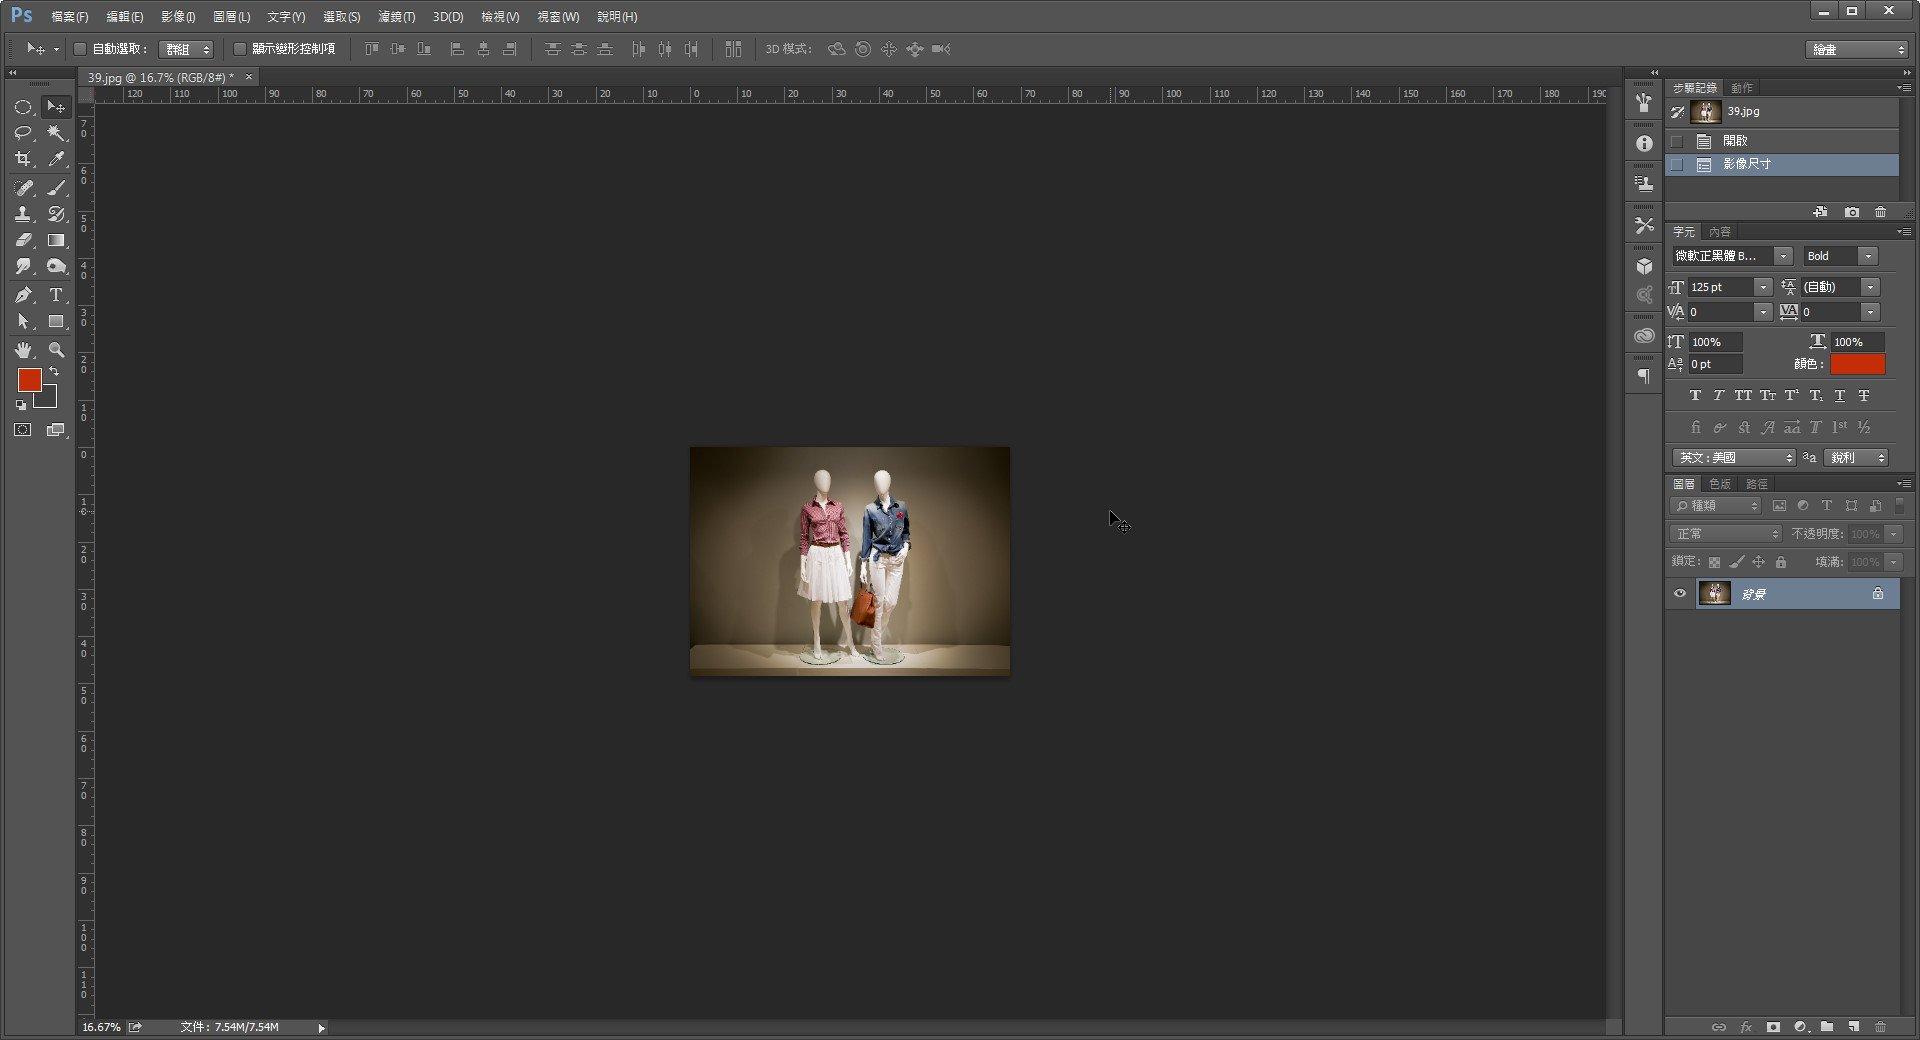 photoshop調整影像尺寸